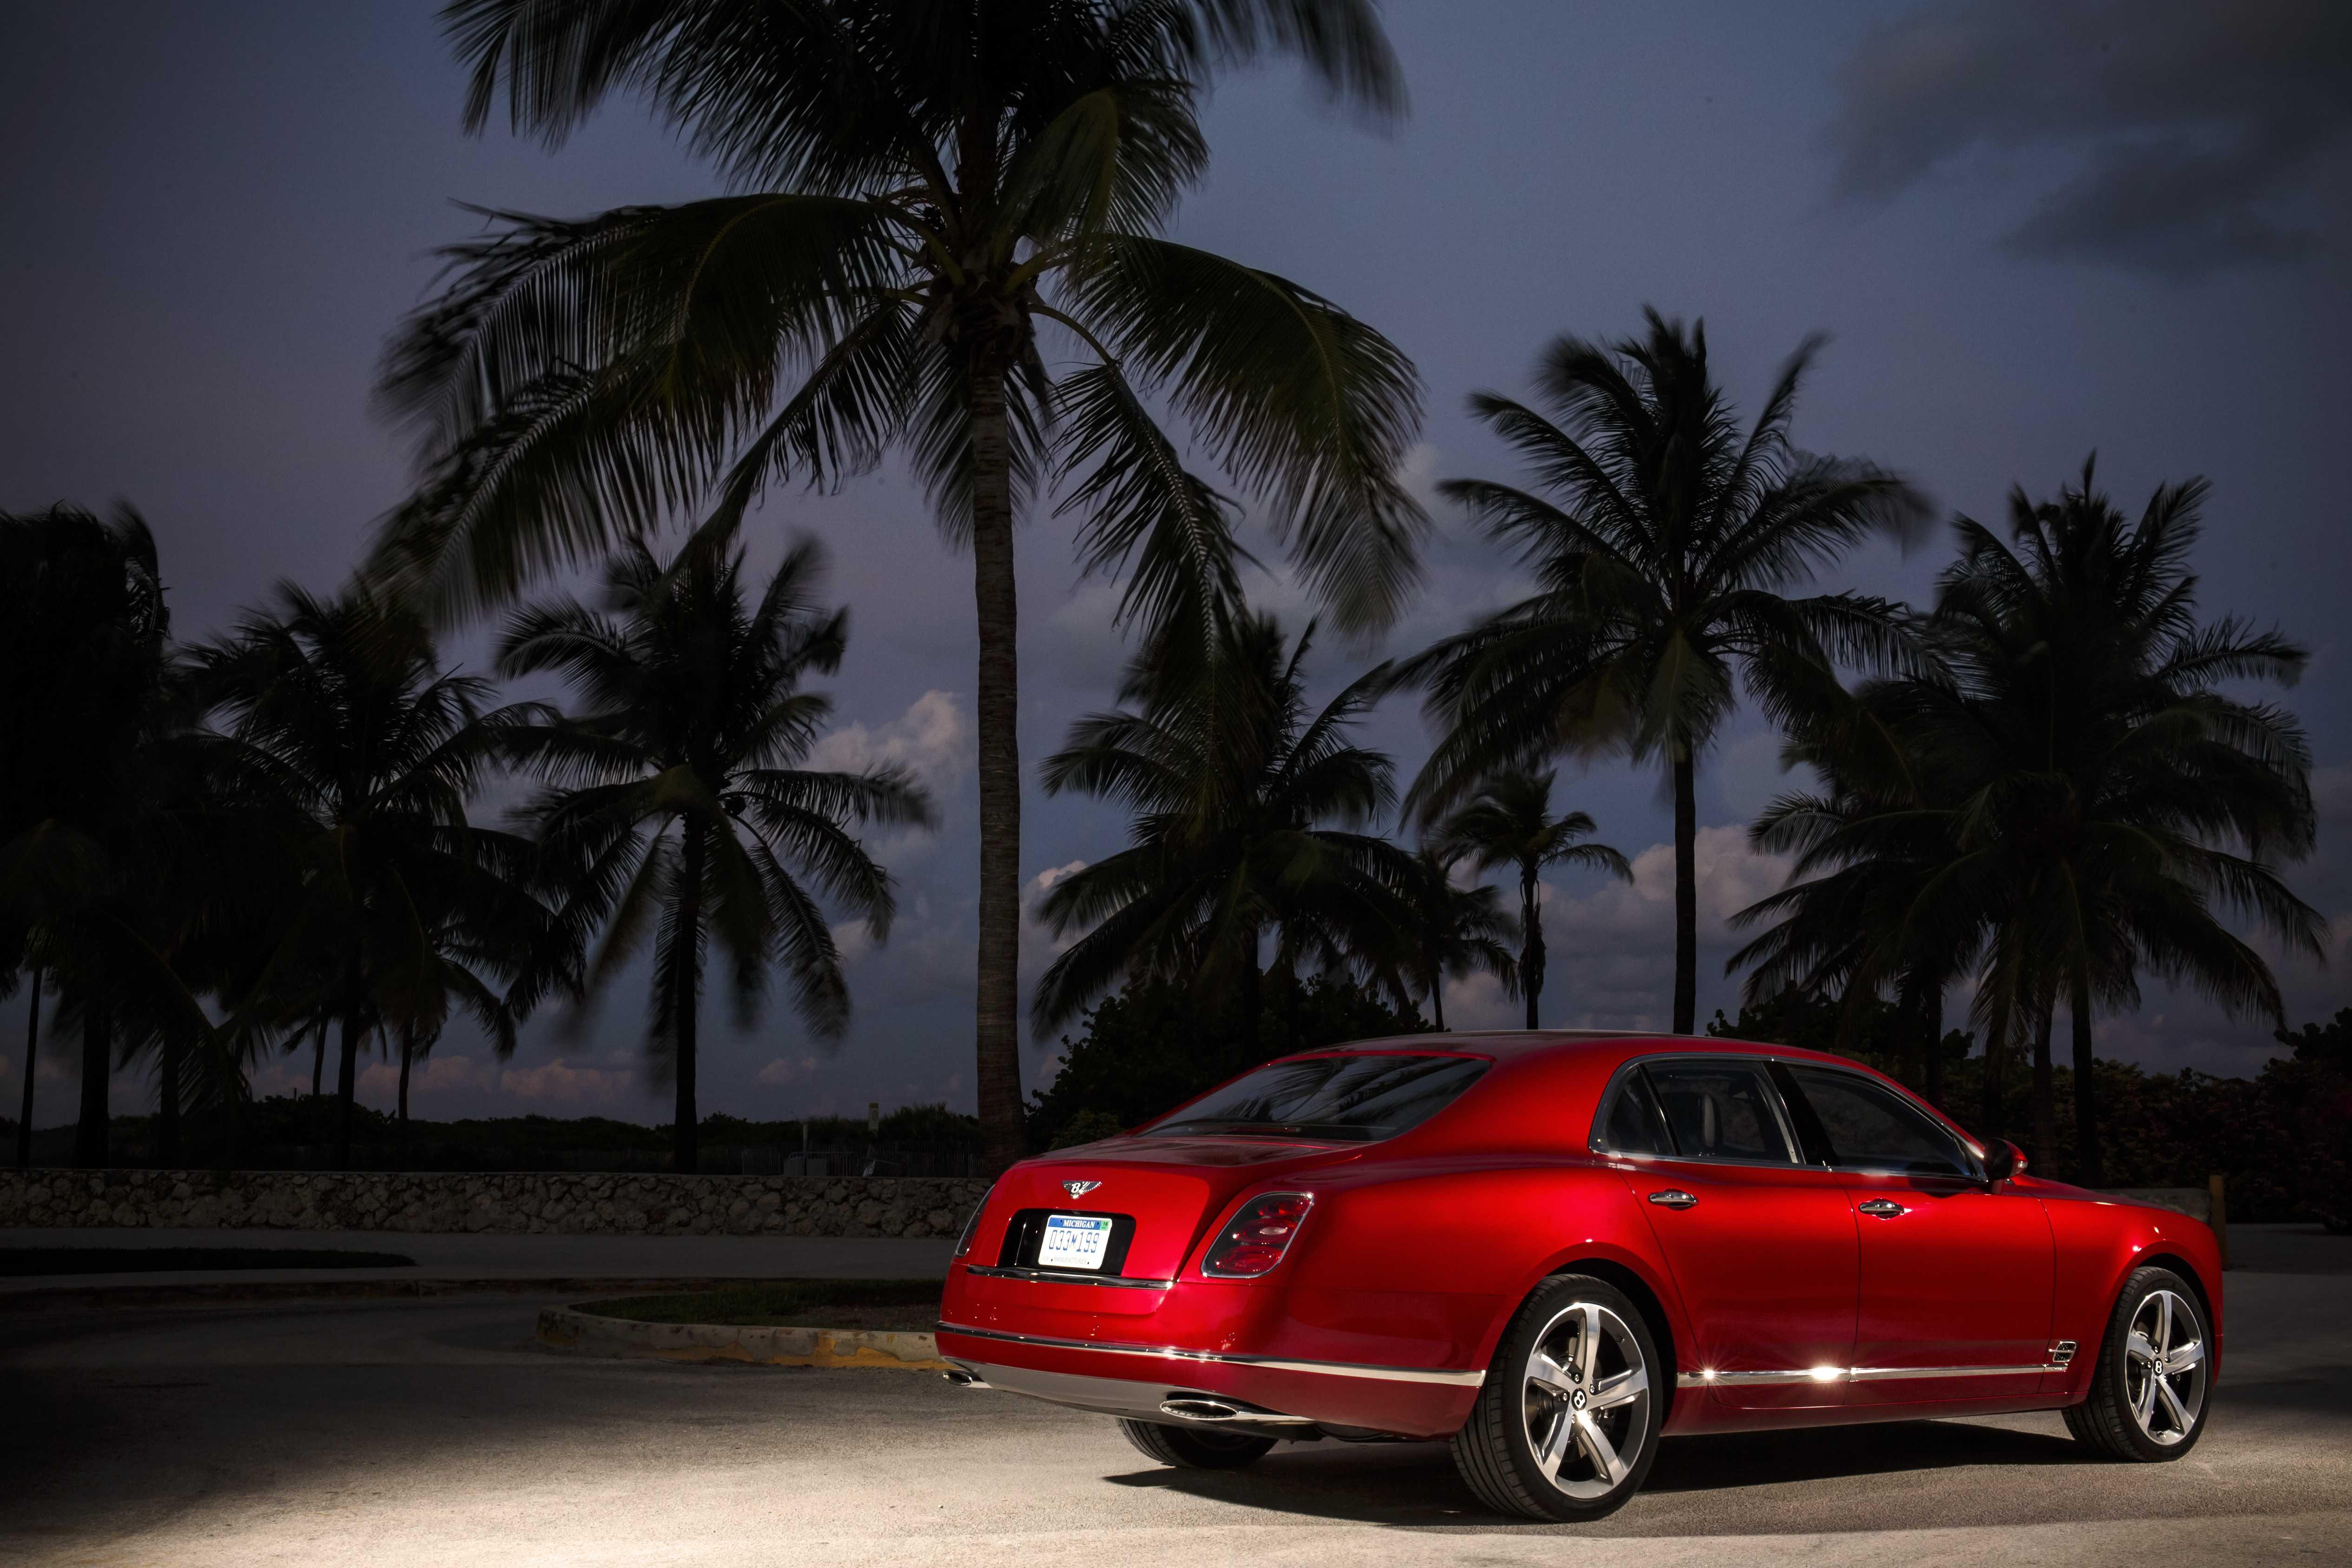 above bentley performance giovanna wheels design pinterest continental cabriolet luxury average pin gfg gt high rims g prior rides wtw supremo prices